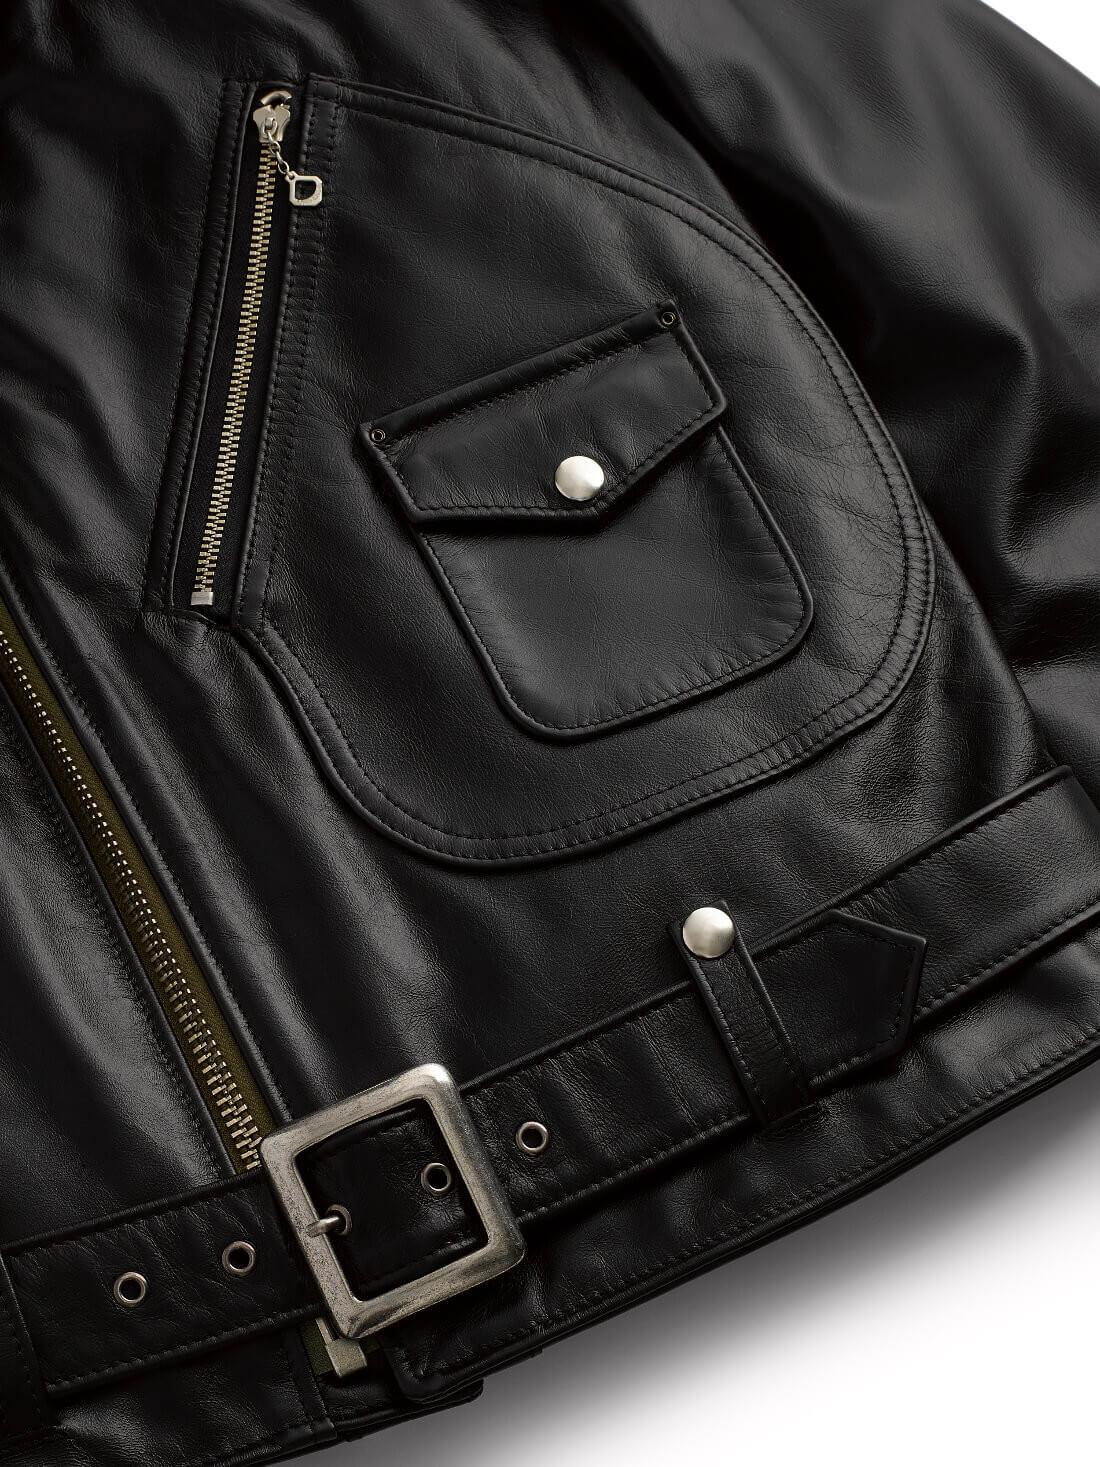 9c6970eb1 Rag & Bone x Schott NYC - PERFECTO Leather Jacket - Ape to Gentleman